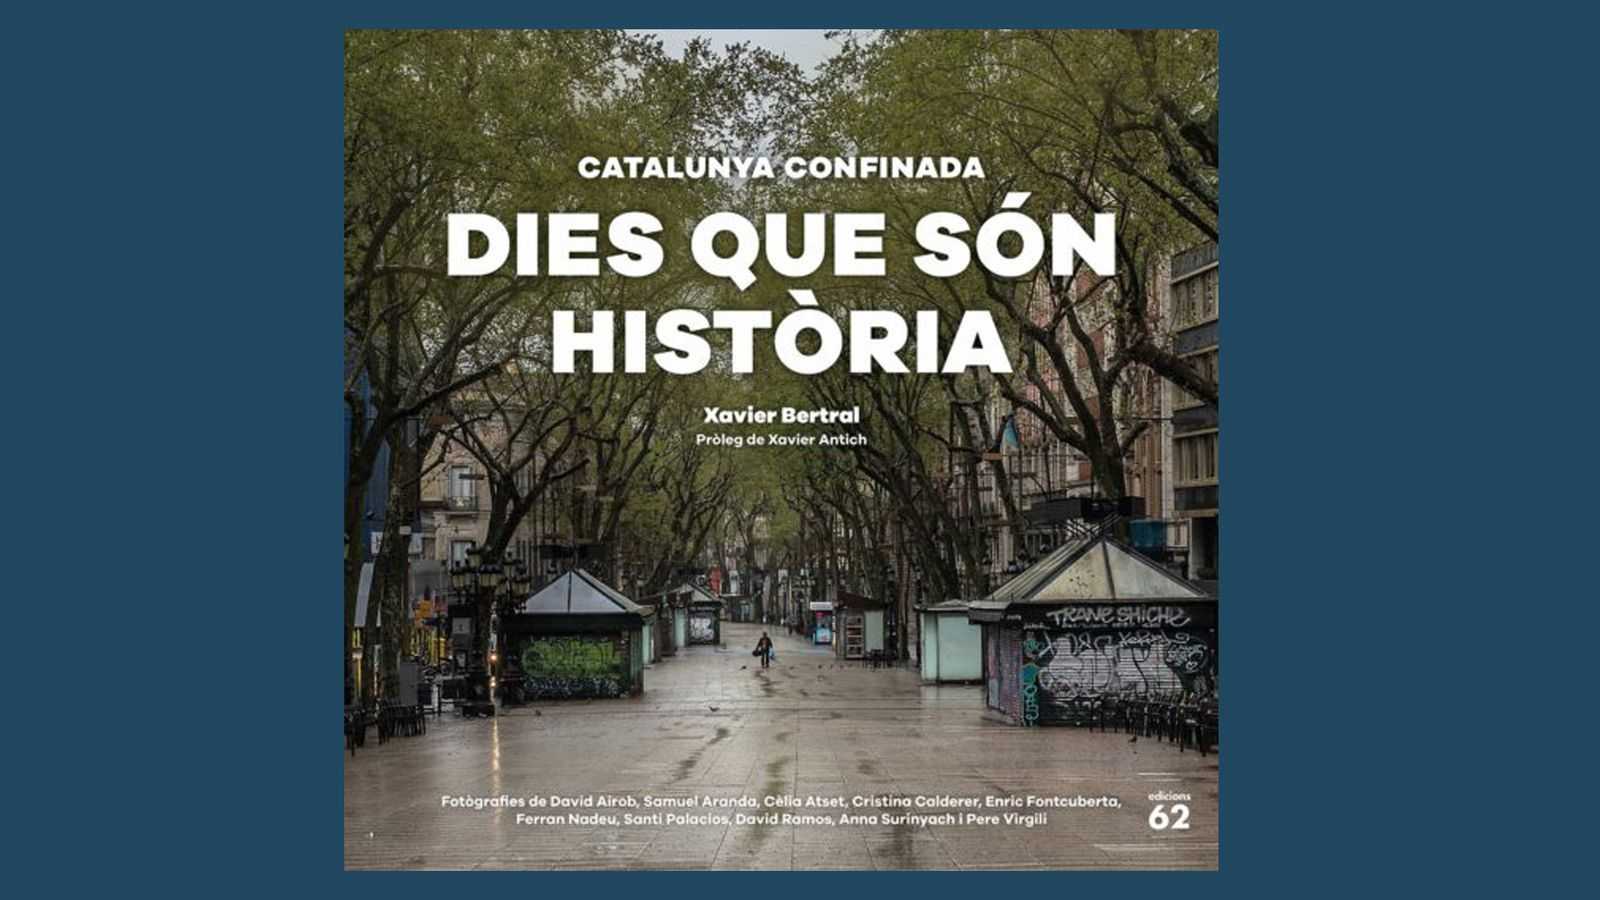 L'anàlisi d'Antoni Bassas: 'Si marxes de pont demà'